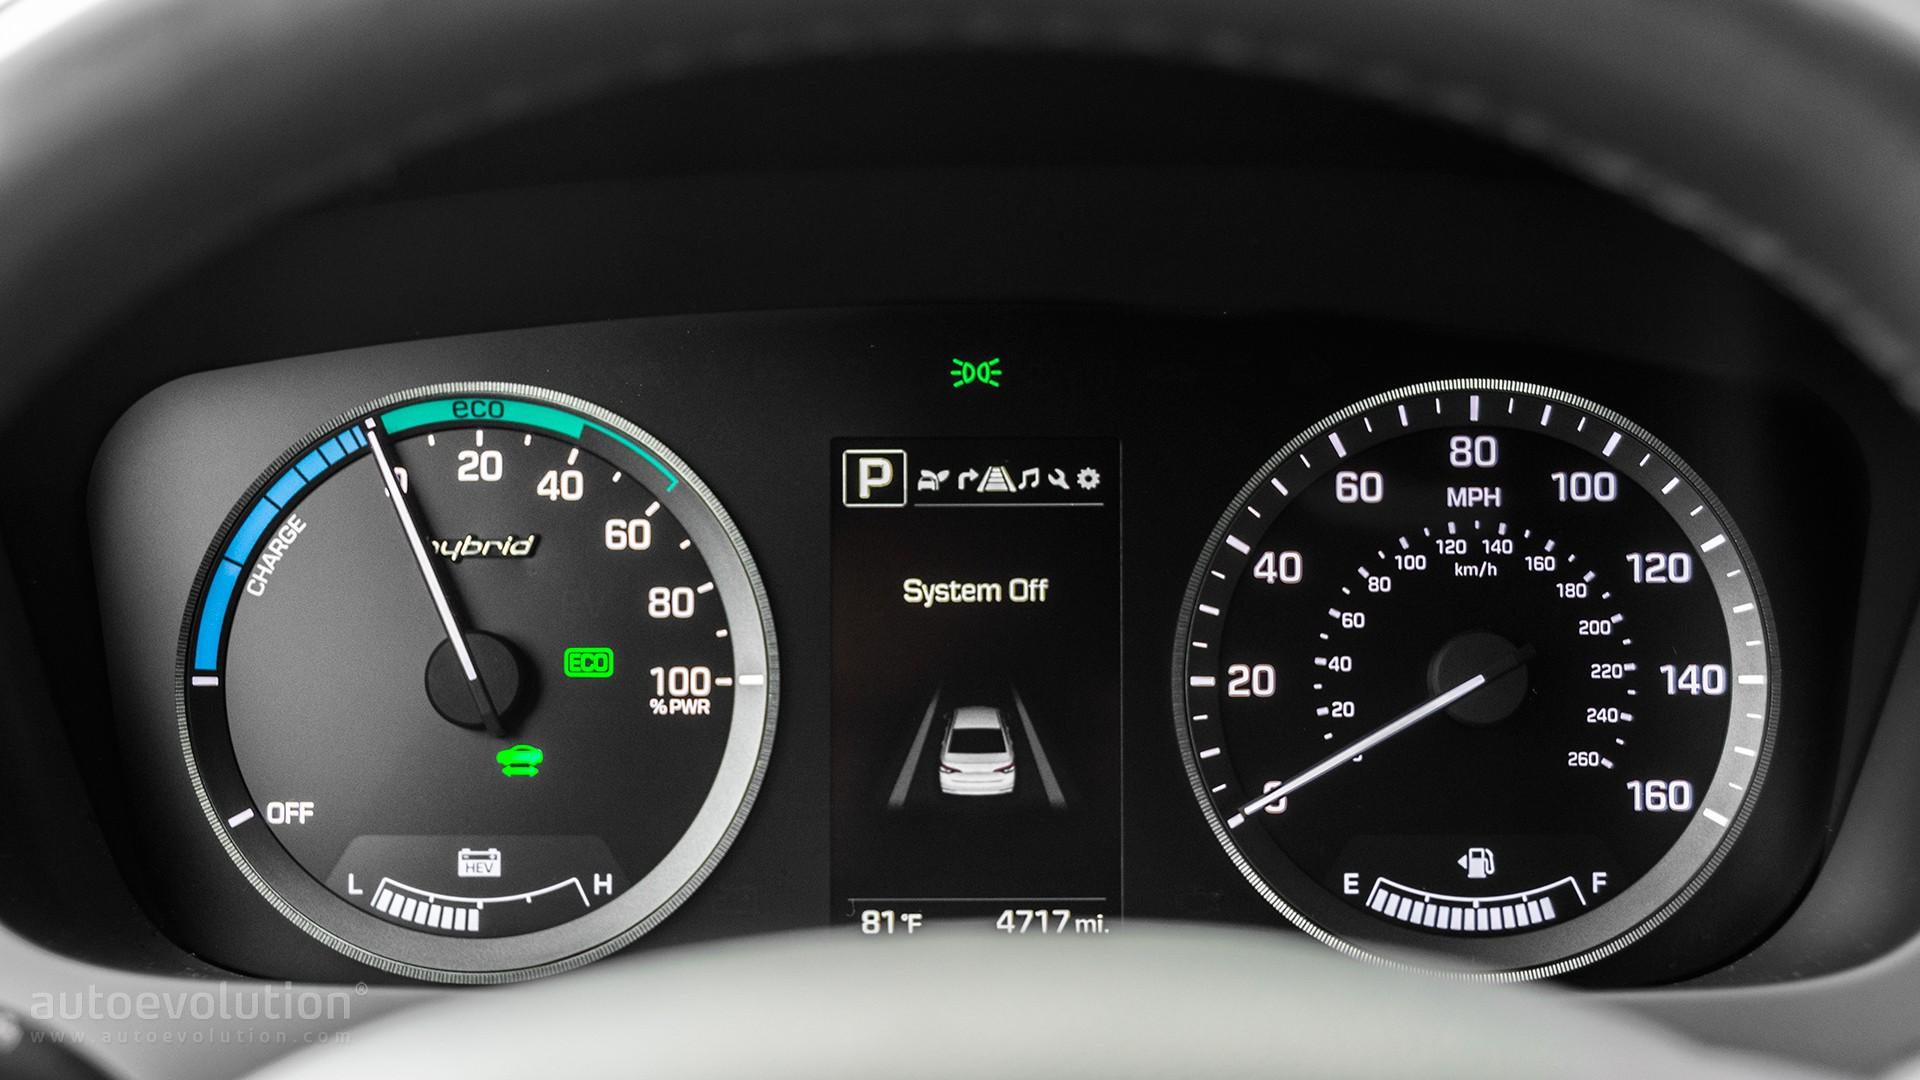 Hyundai motor america 1 of 114 2020 hyundai sonata 40. 2016 Hyundai Sonata Hybrid Review Autoevolution